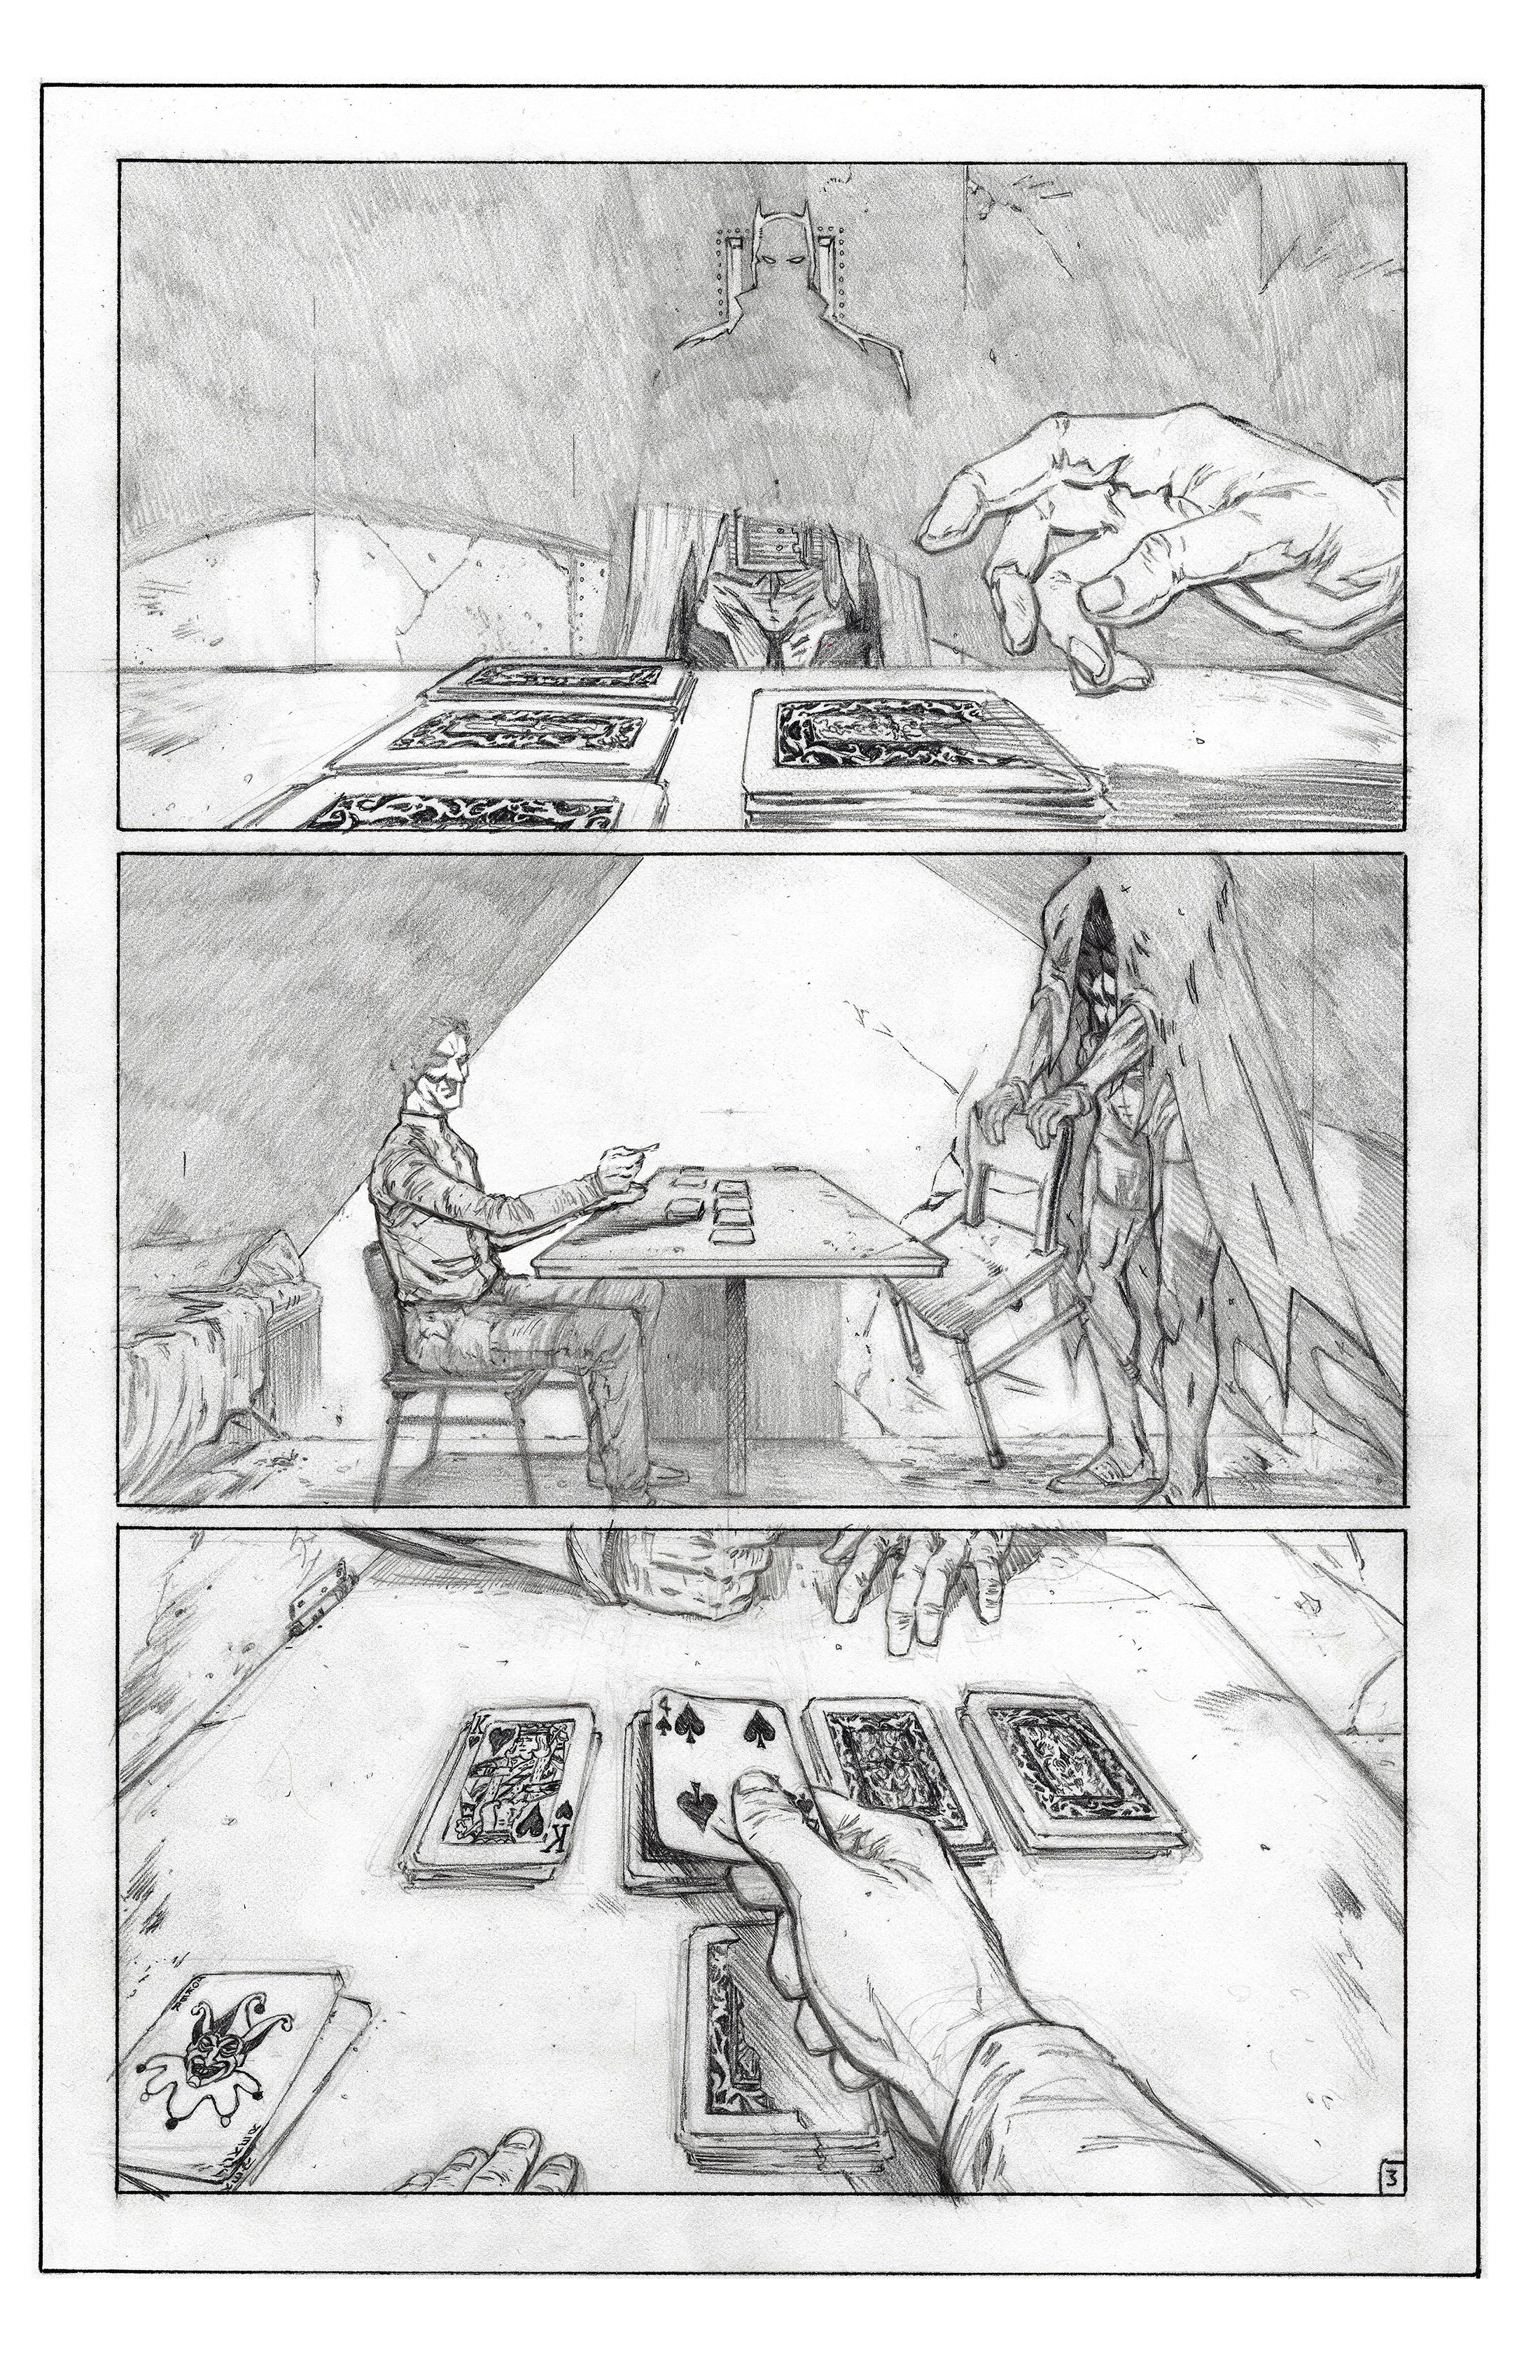 The Killing Joke DC Sample page 3 pencils